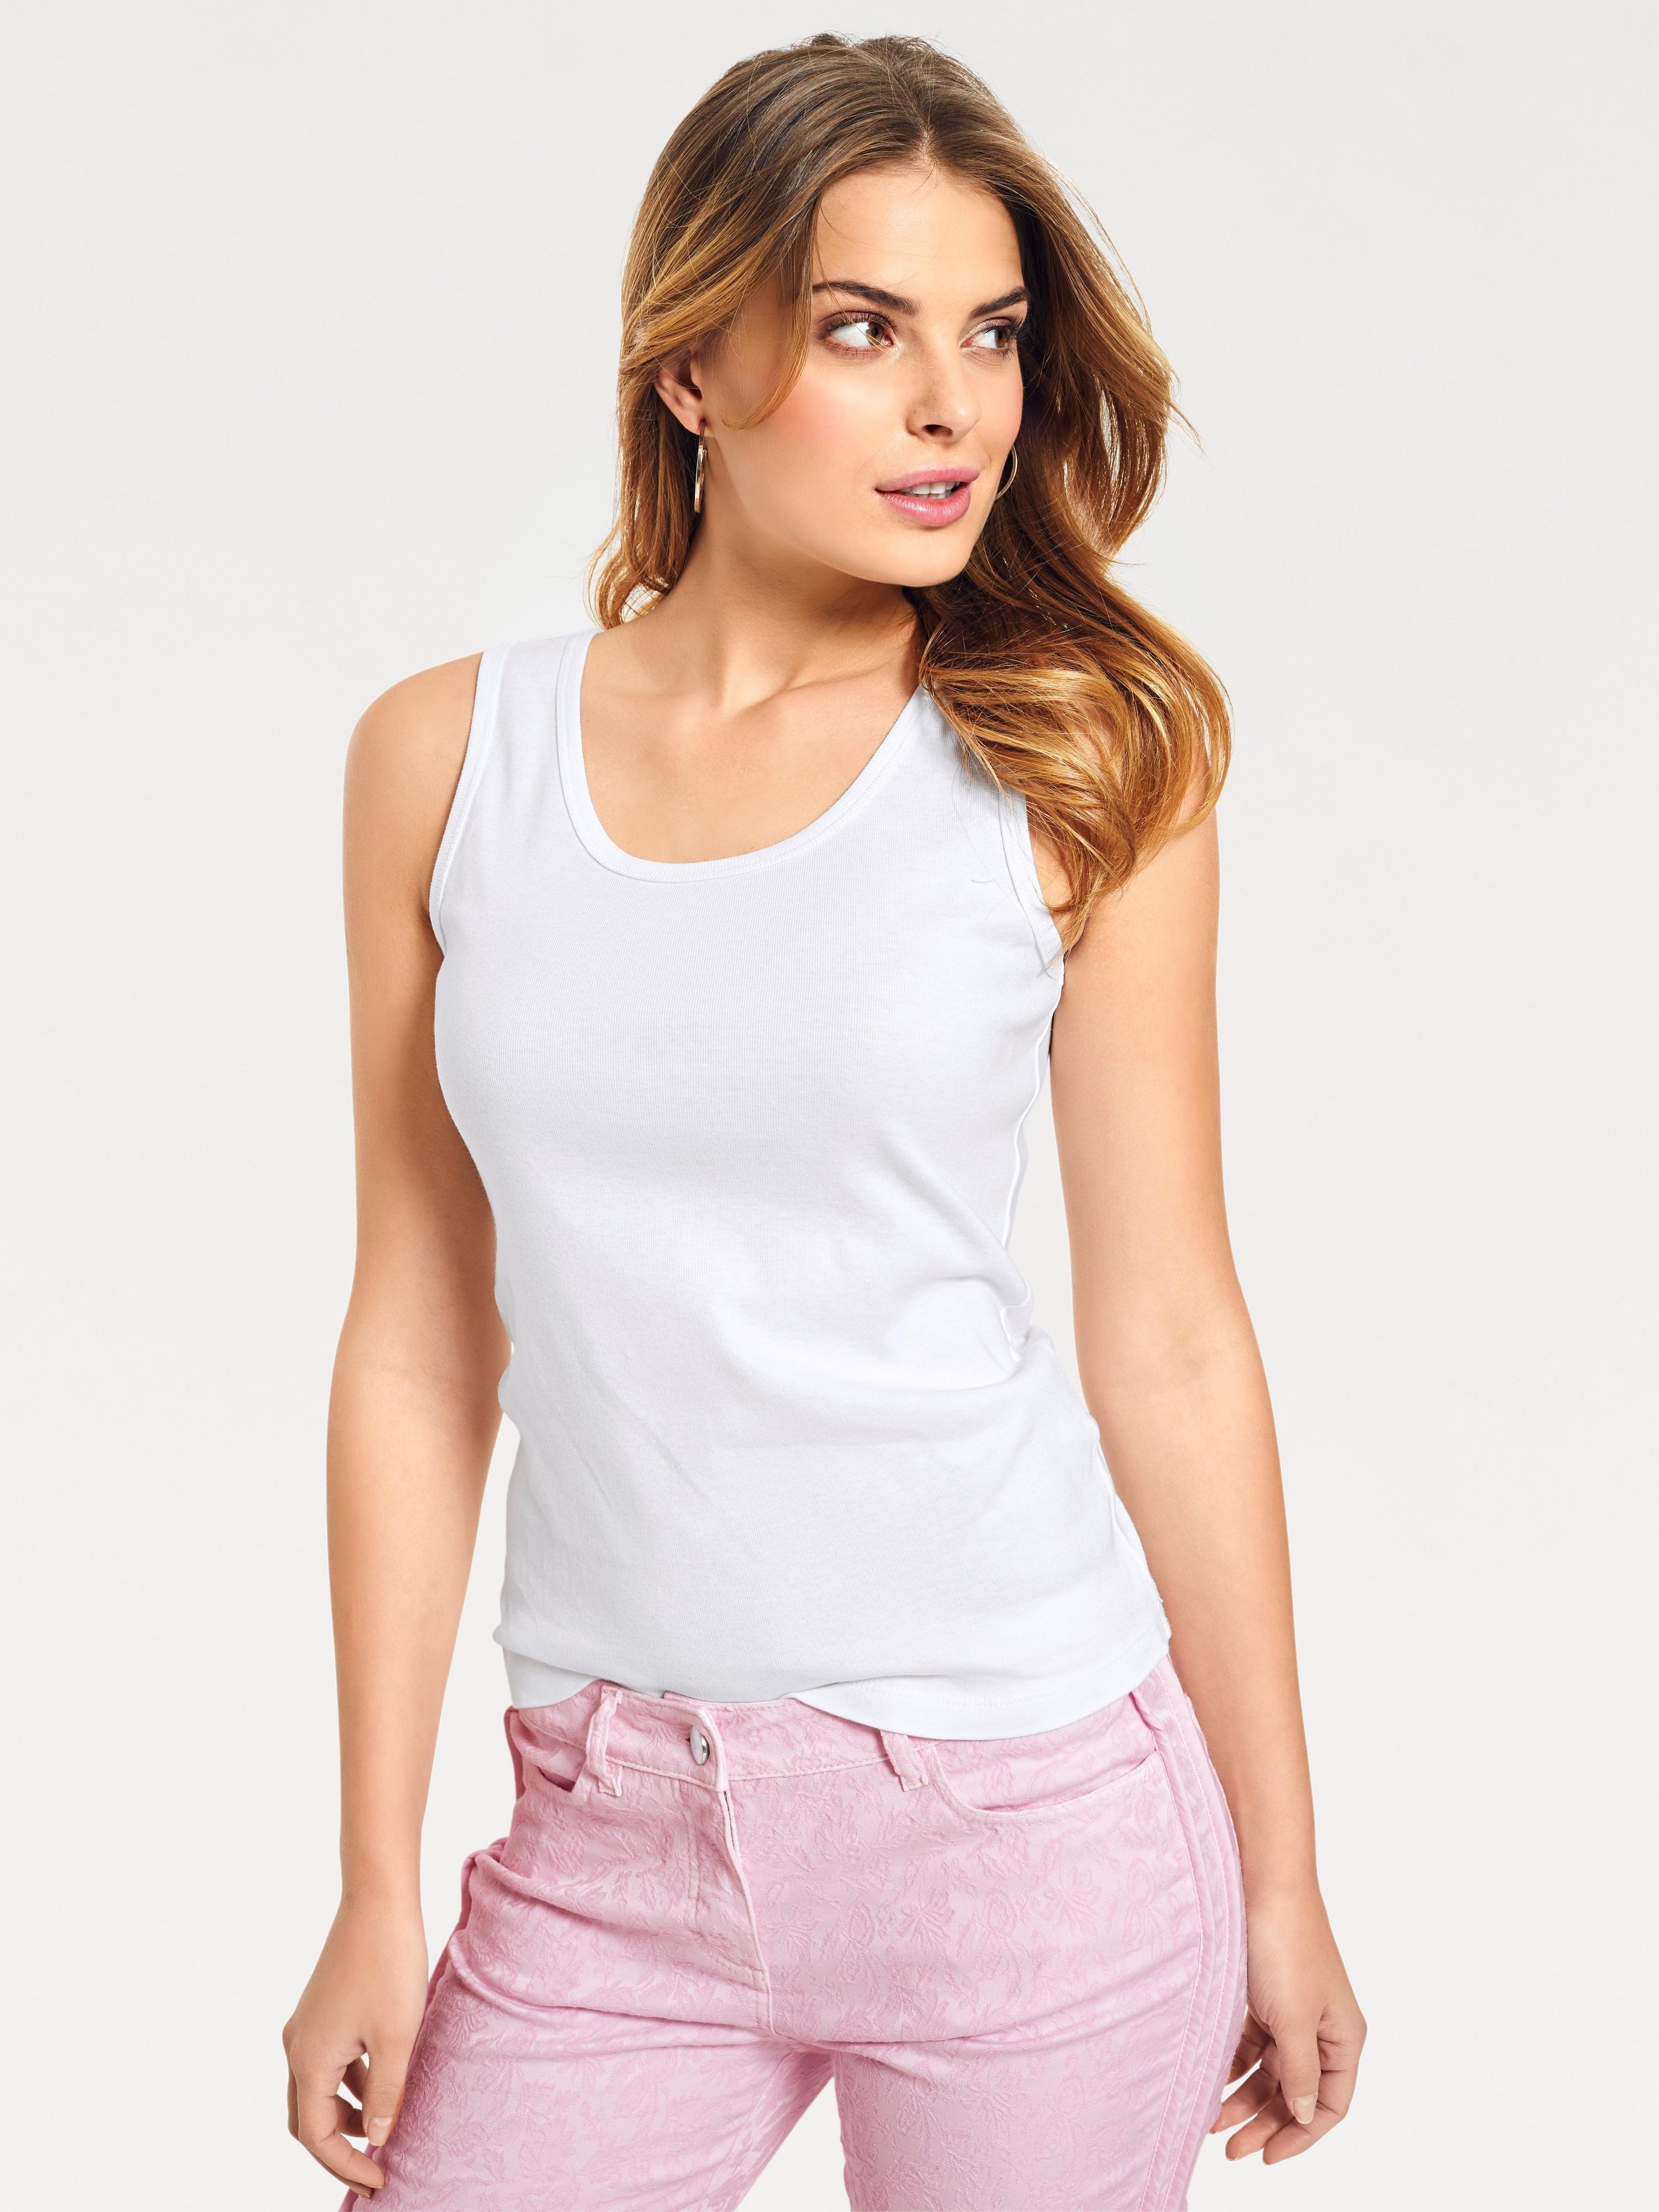 Shirt2 Bij deligBestel Shirt2 Bij Shirt2 deligBestel deligBestel Nu Bij Nu Nu deligBestel Shirt2 EWD92IH